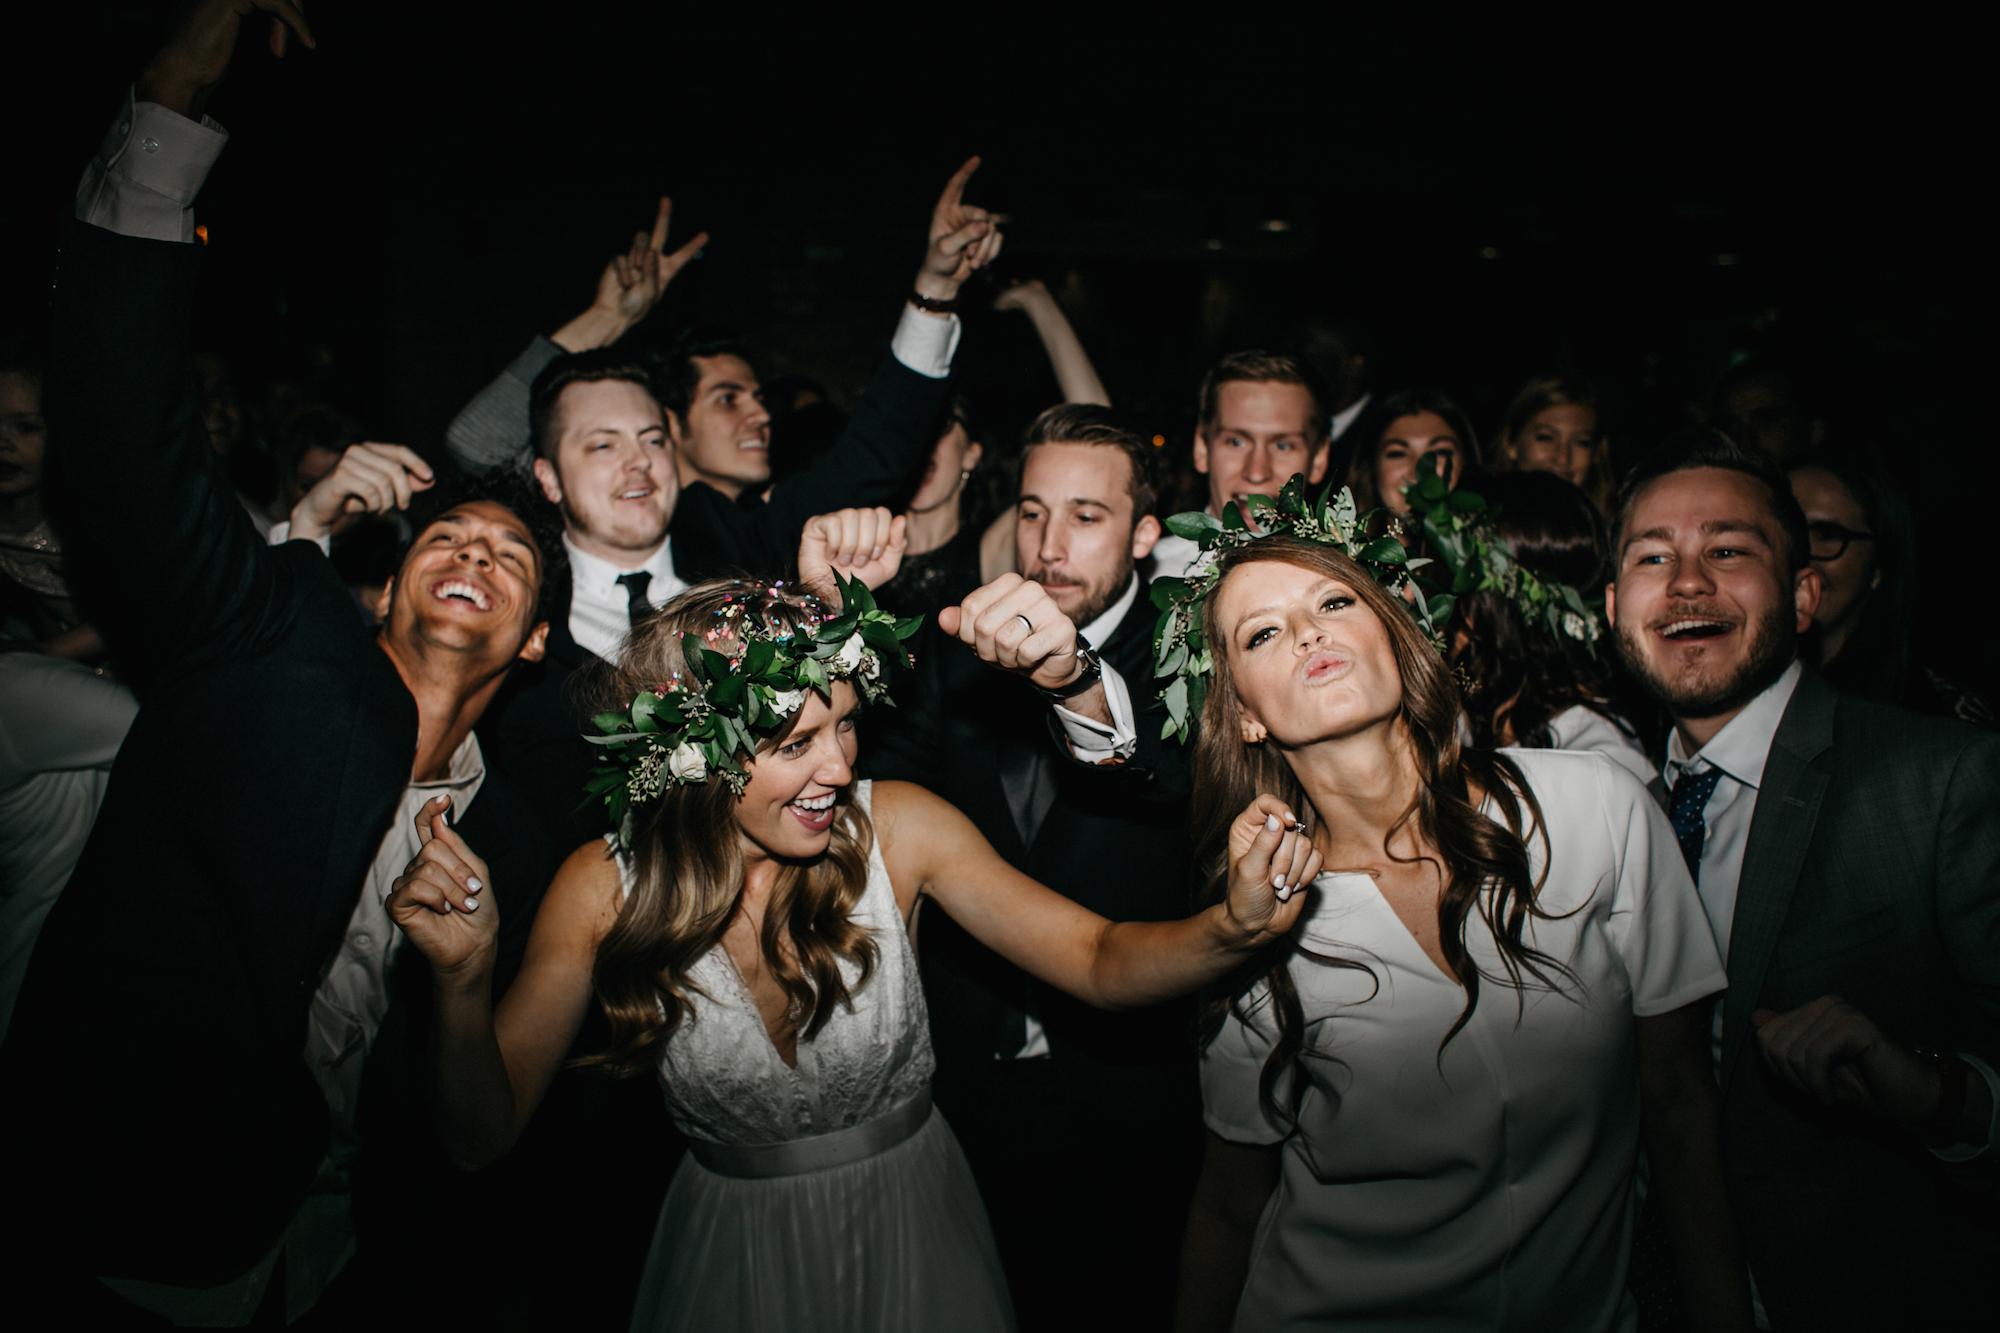 arizona - wedding - photographer 575.jpg